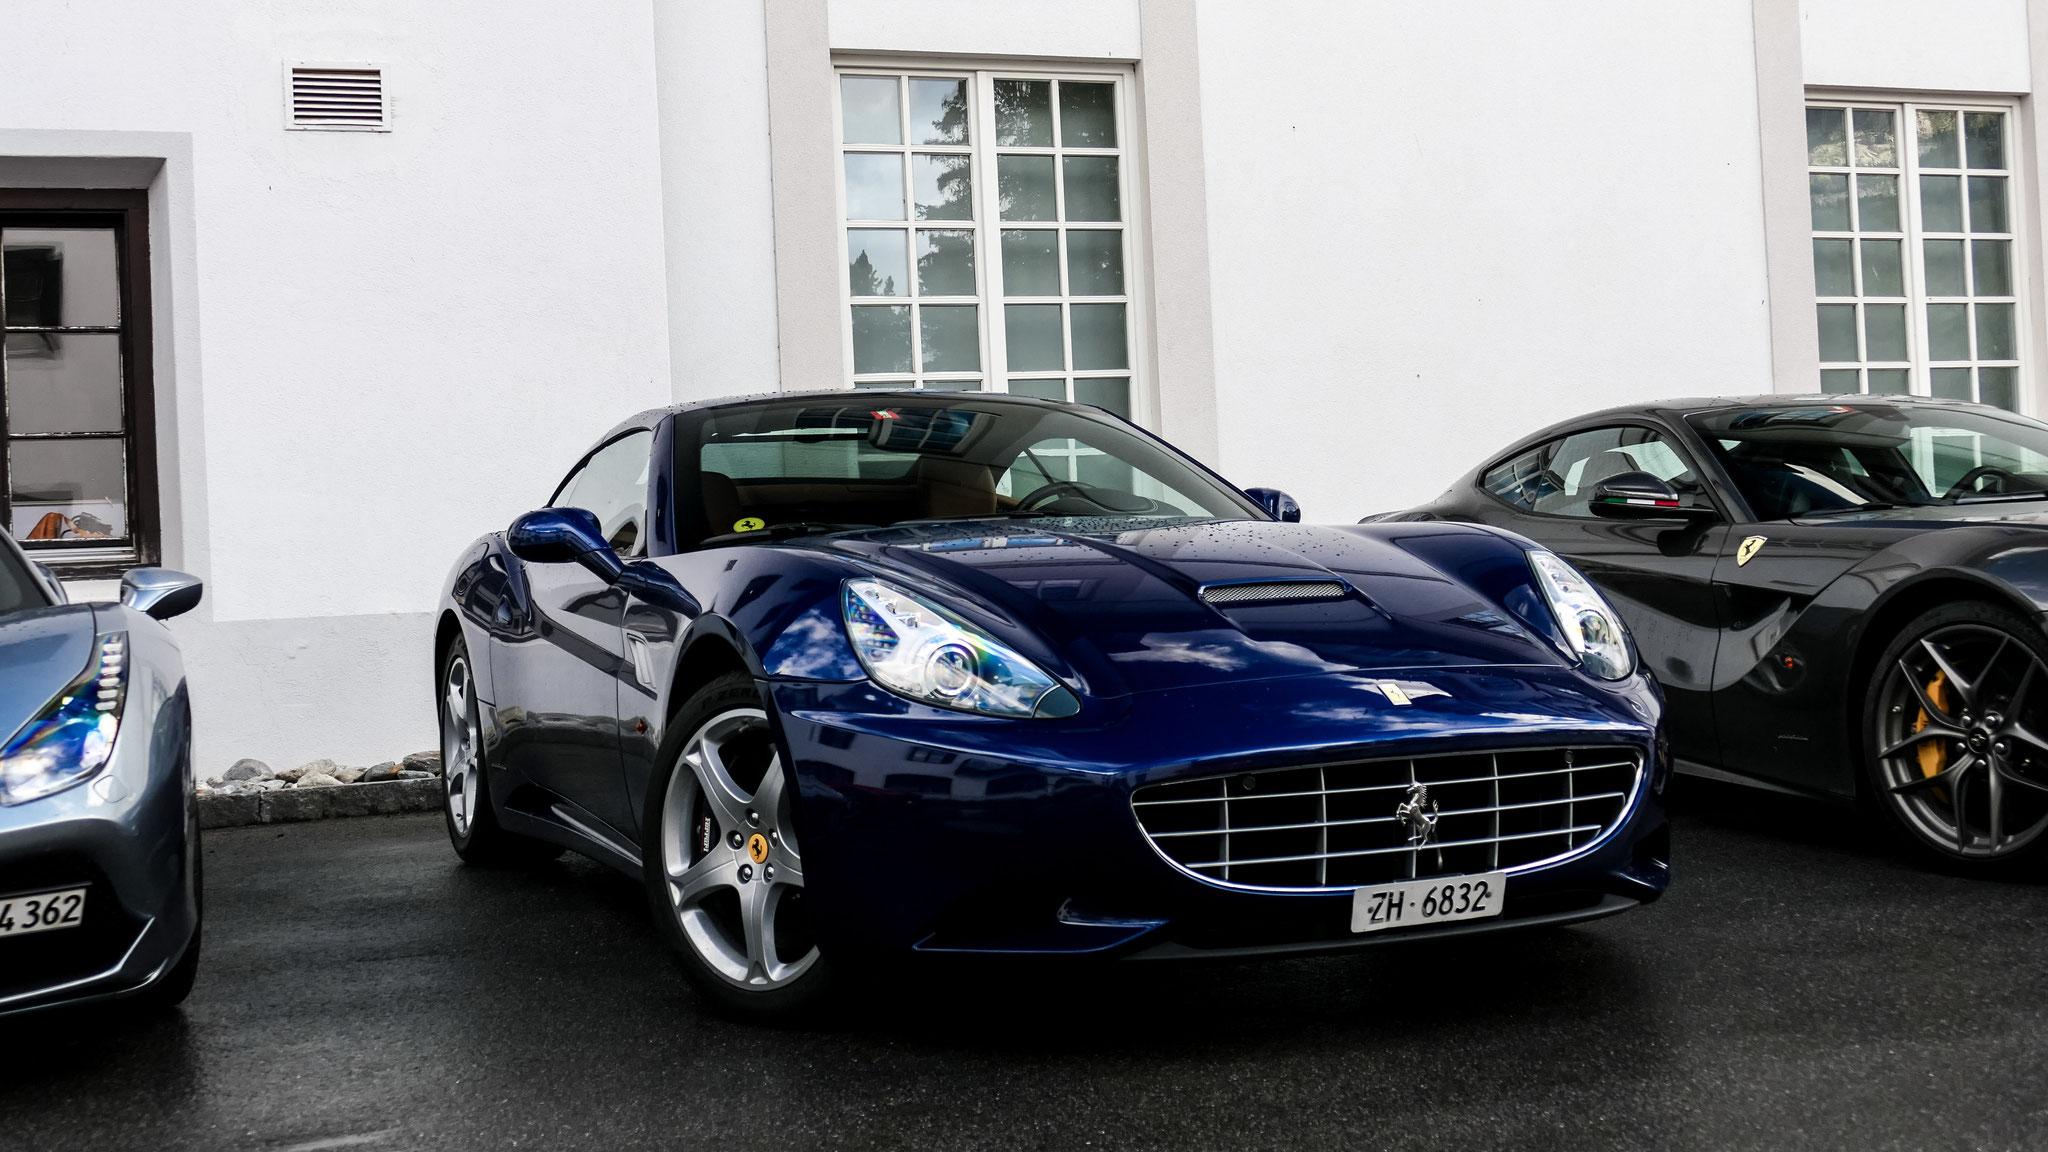 Ferrari California - ZH-6832 (CH)